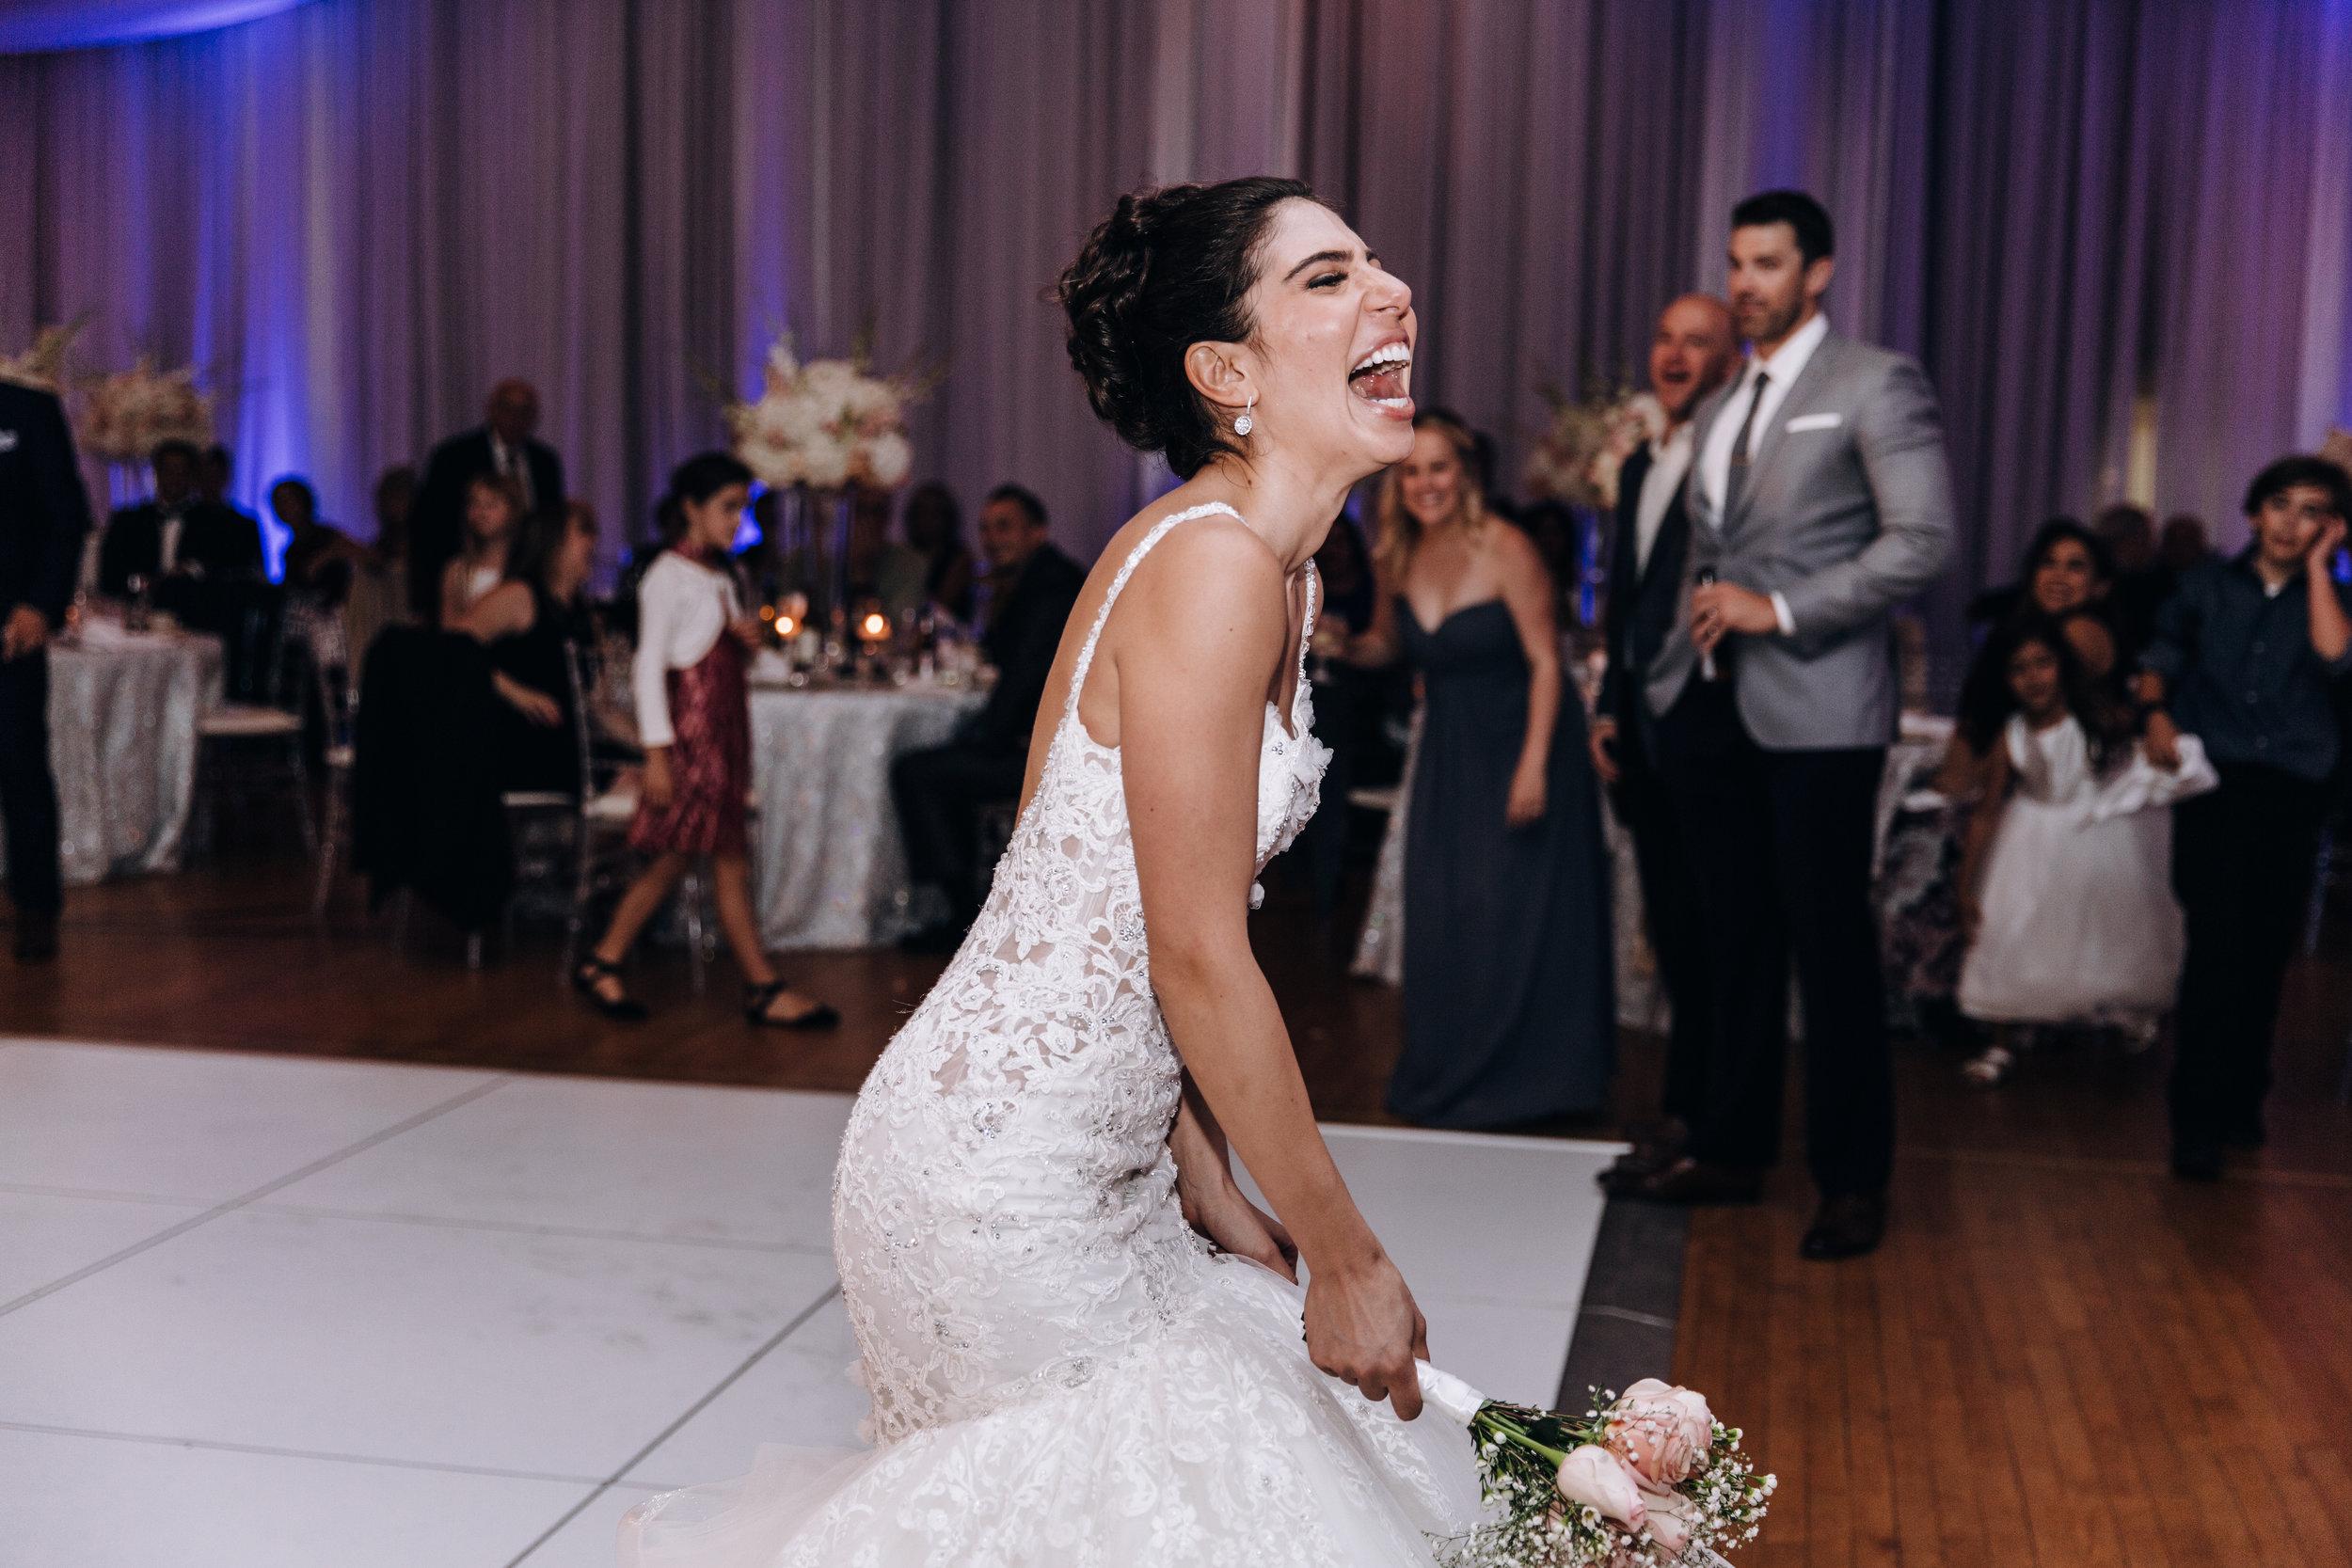 KaraNixonWeddings-GreekOrthodox-Oakland-Wedding-64.jpg